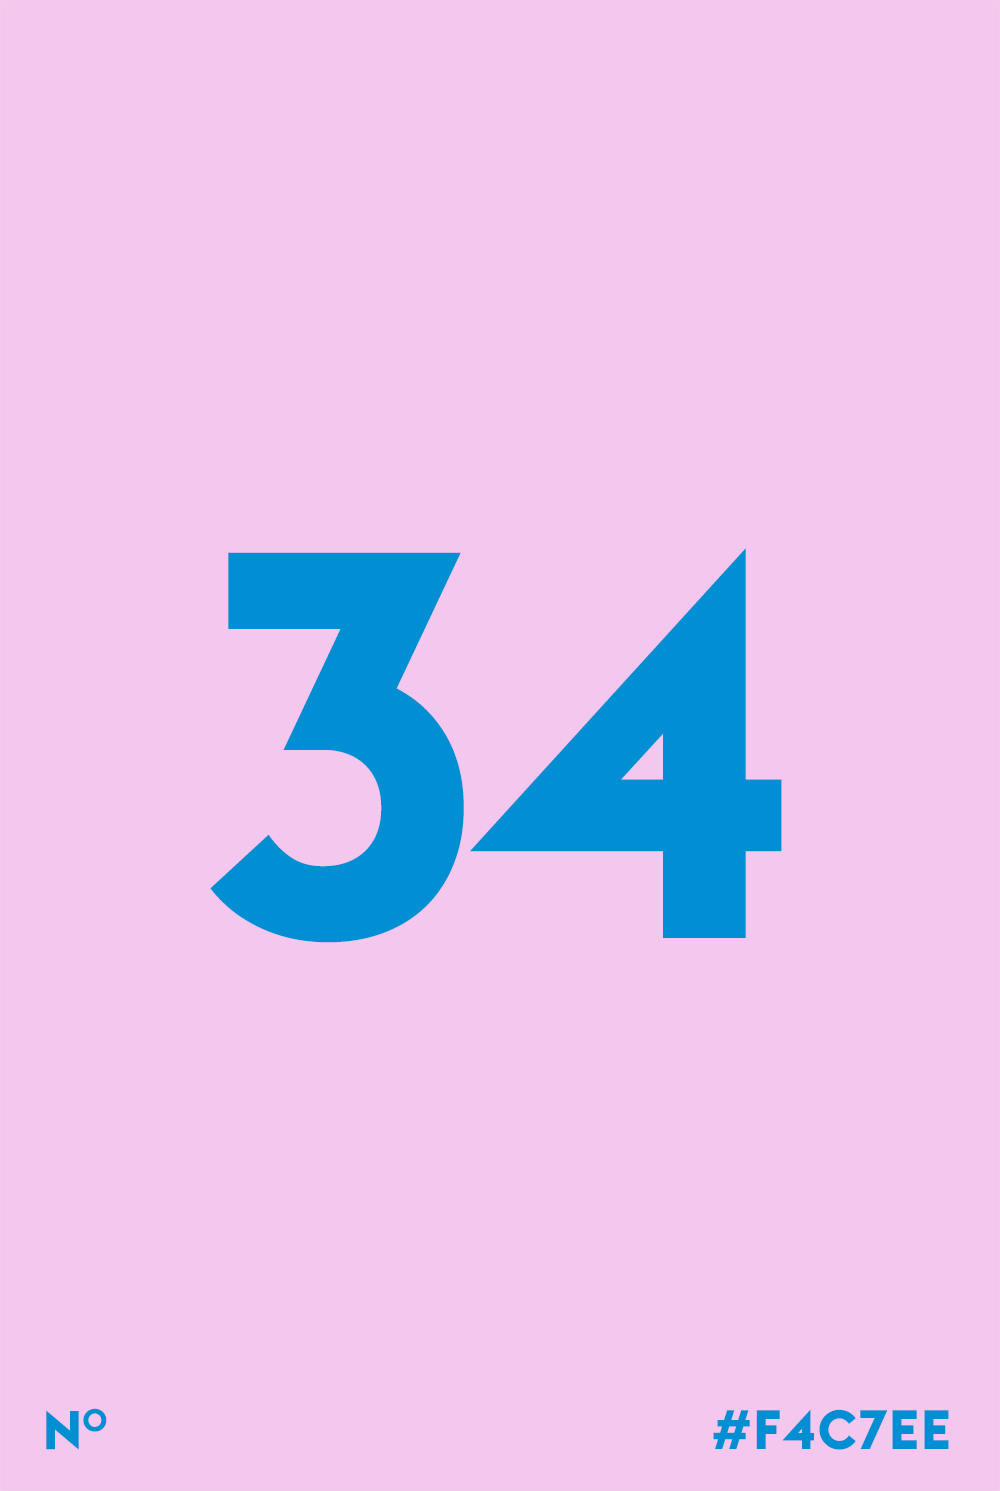 cc_0033_34